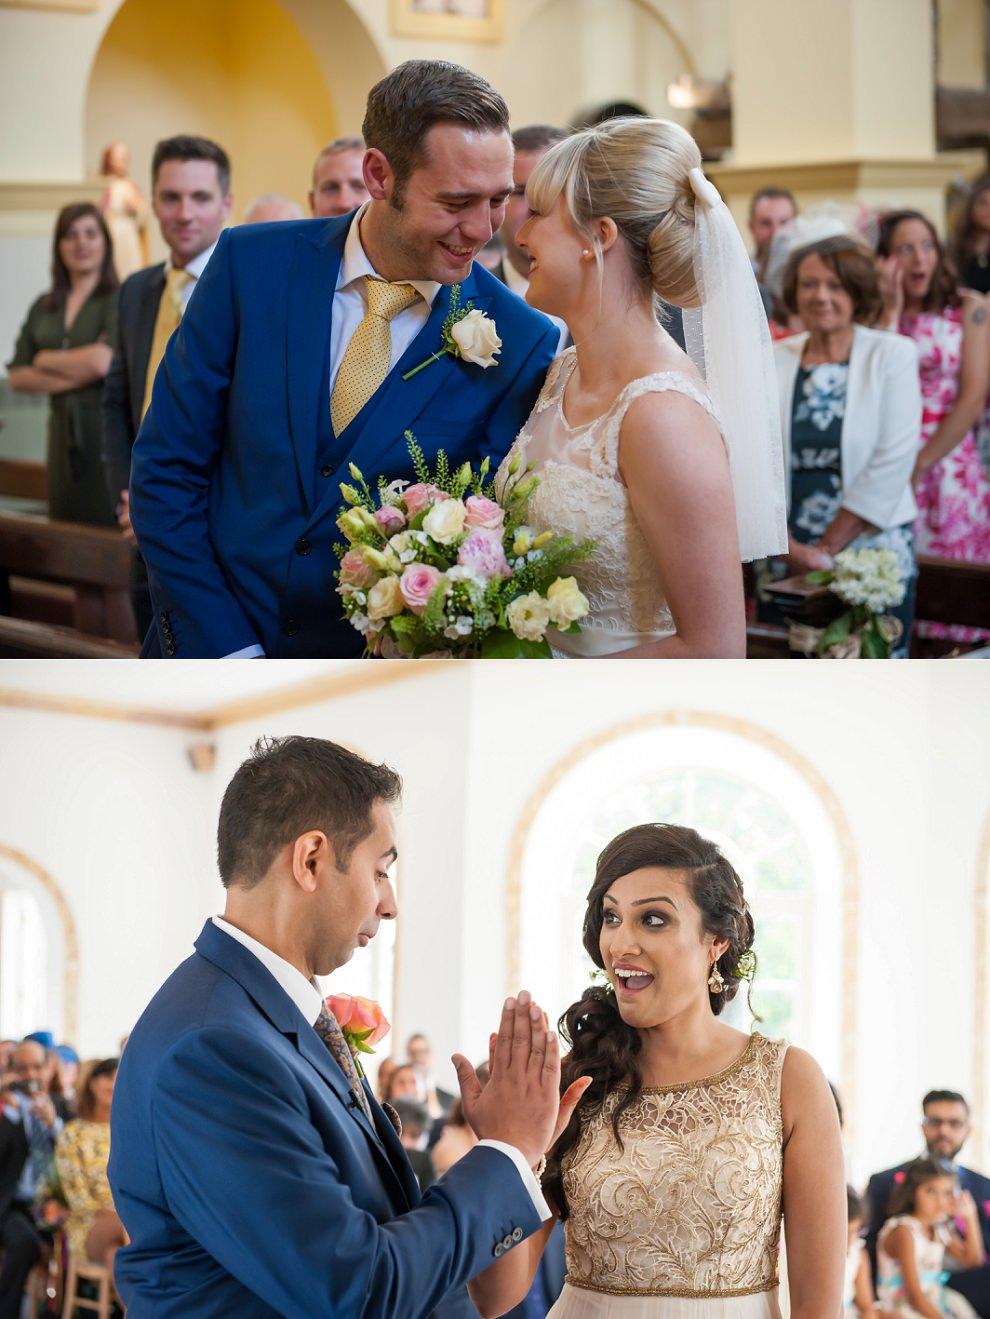 Best-wedding-photos-UK-2015-072